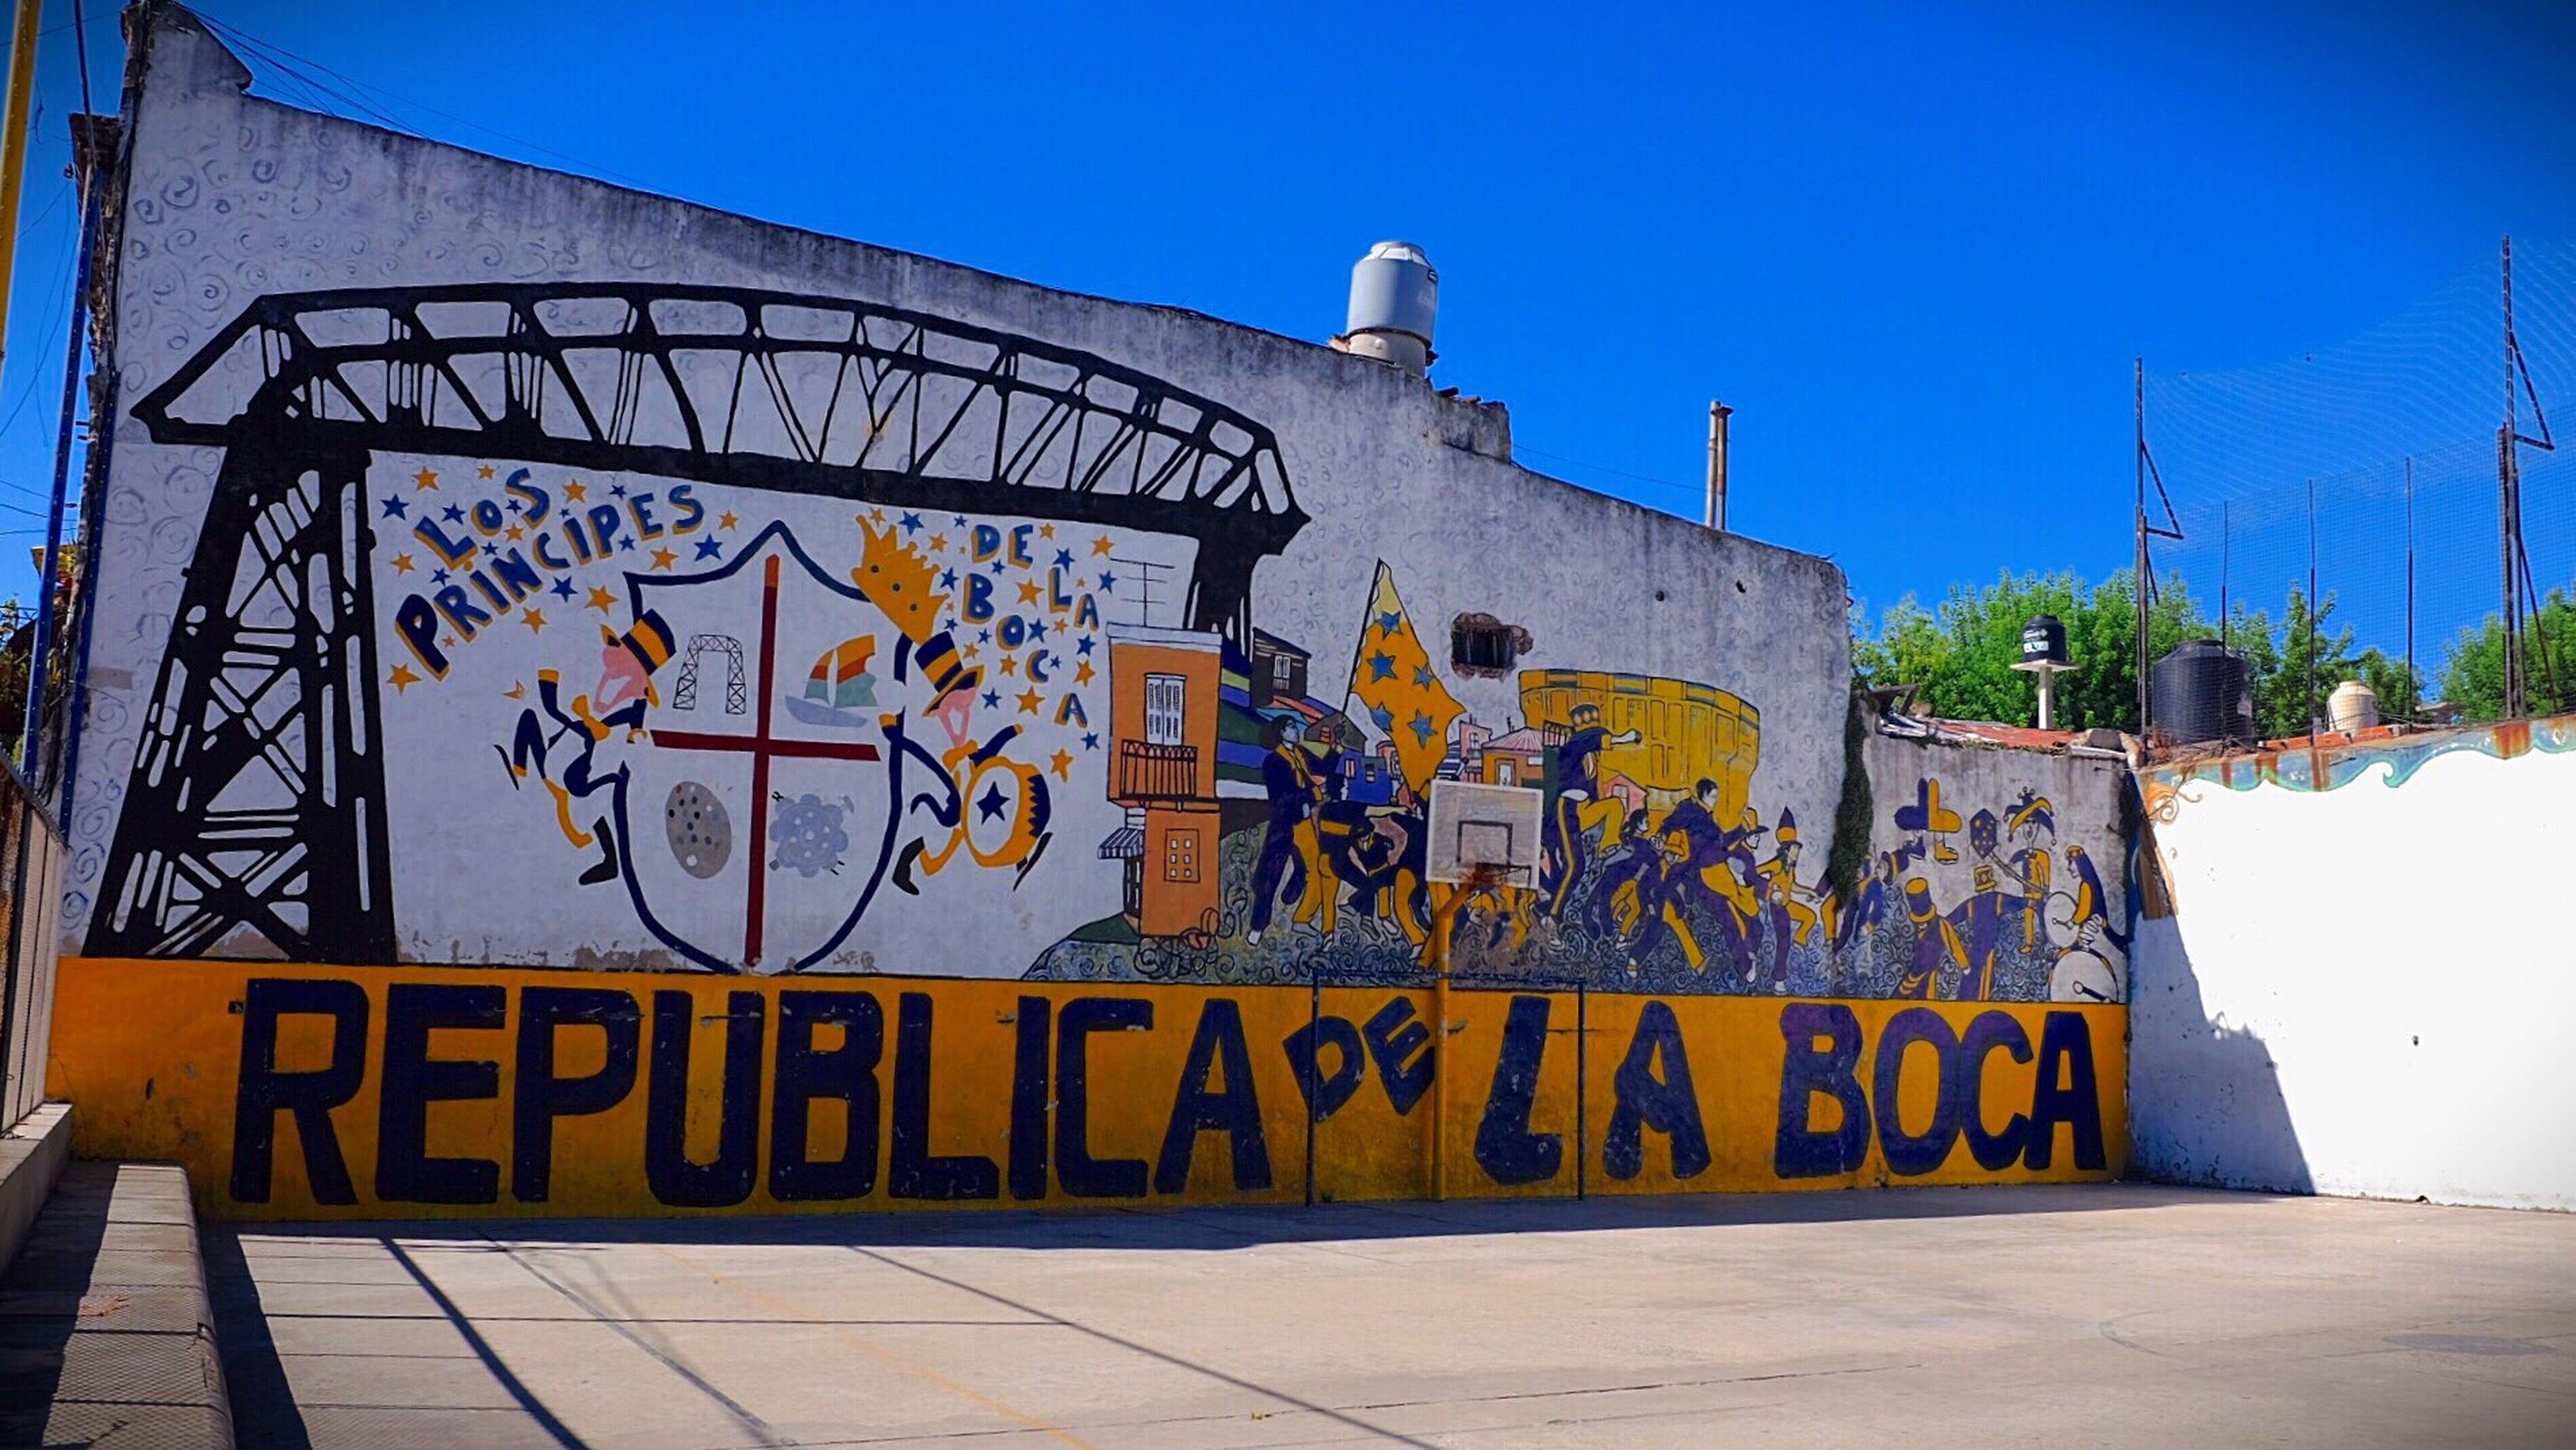 graffiti, street art, blue, city, outdoors, day, no people, amusement park